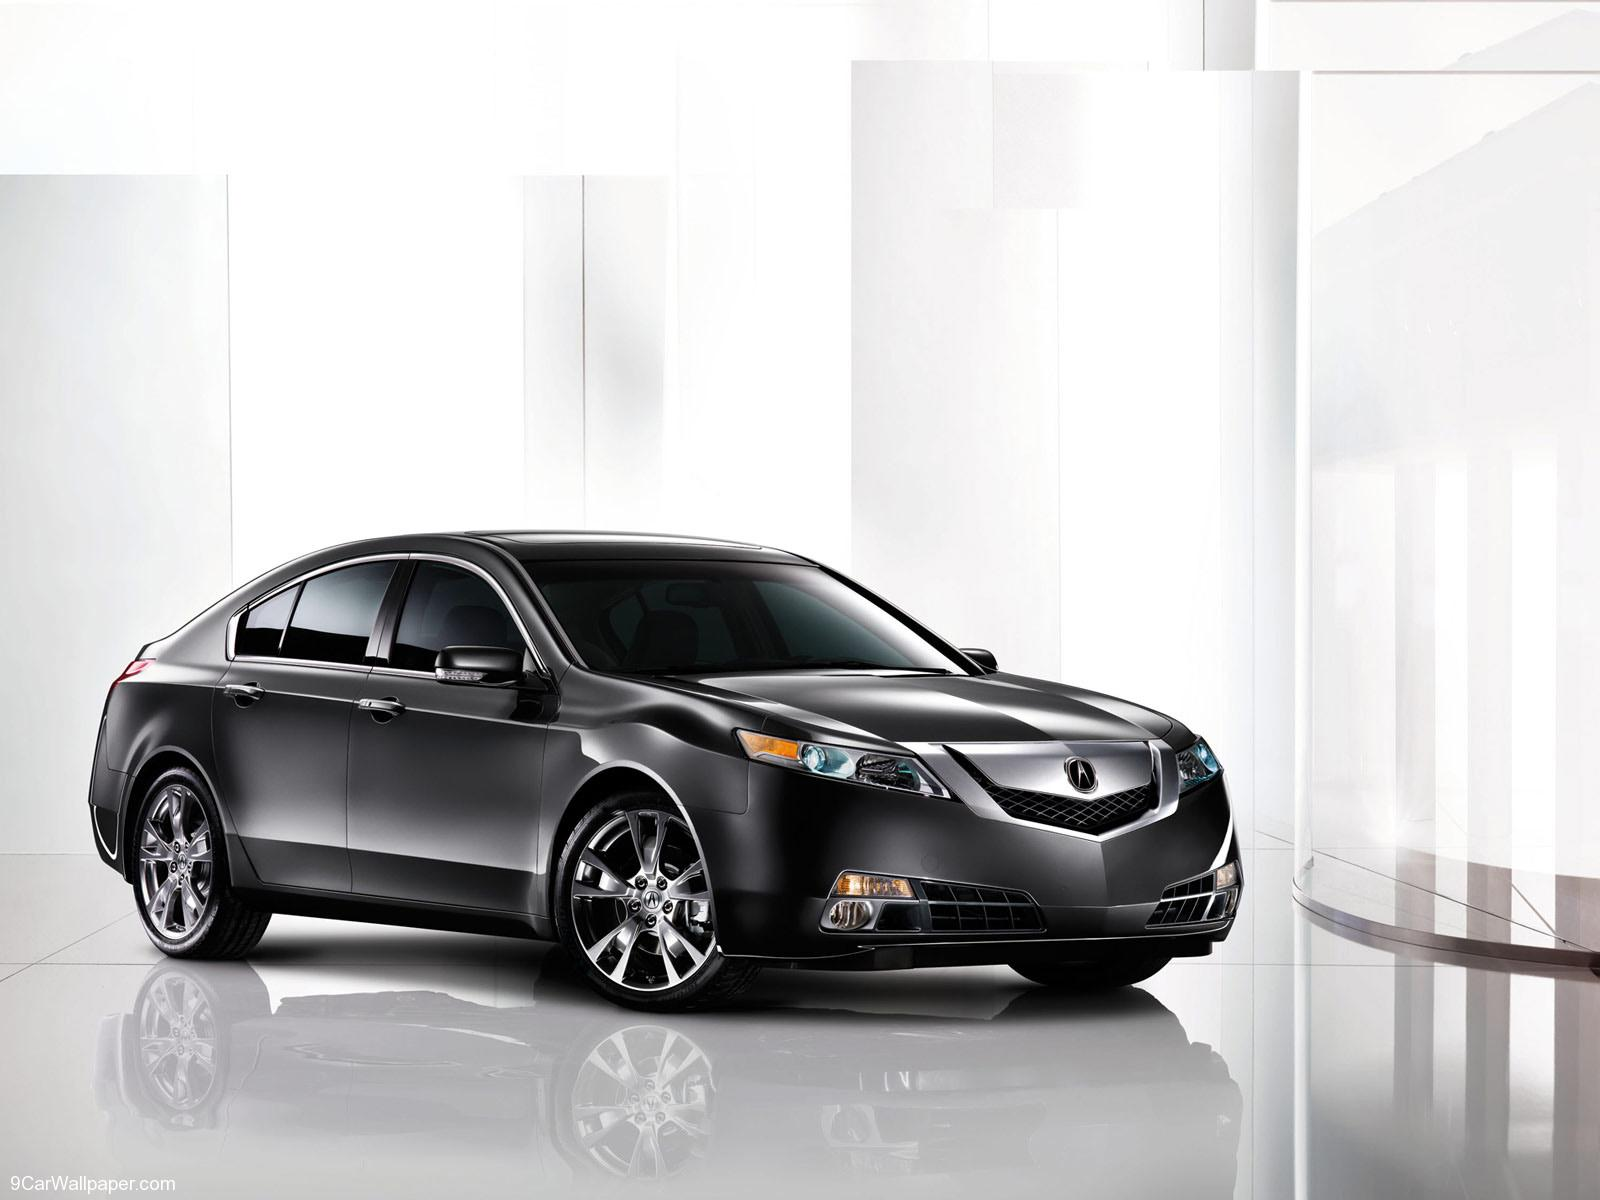 Black Acura Wallpaper